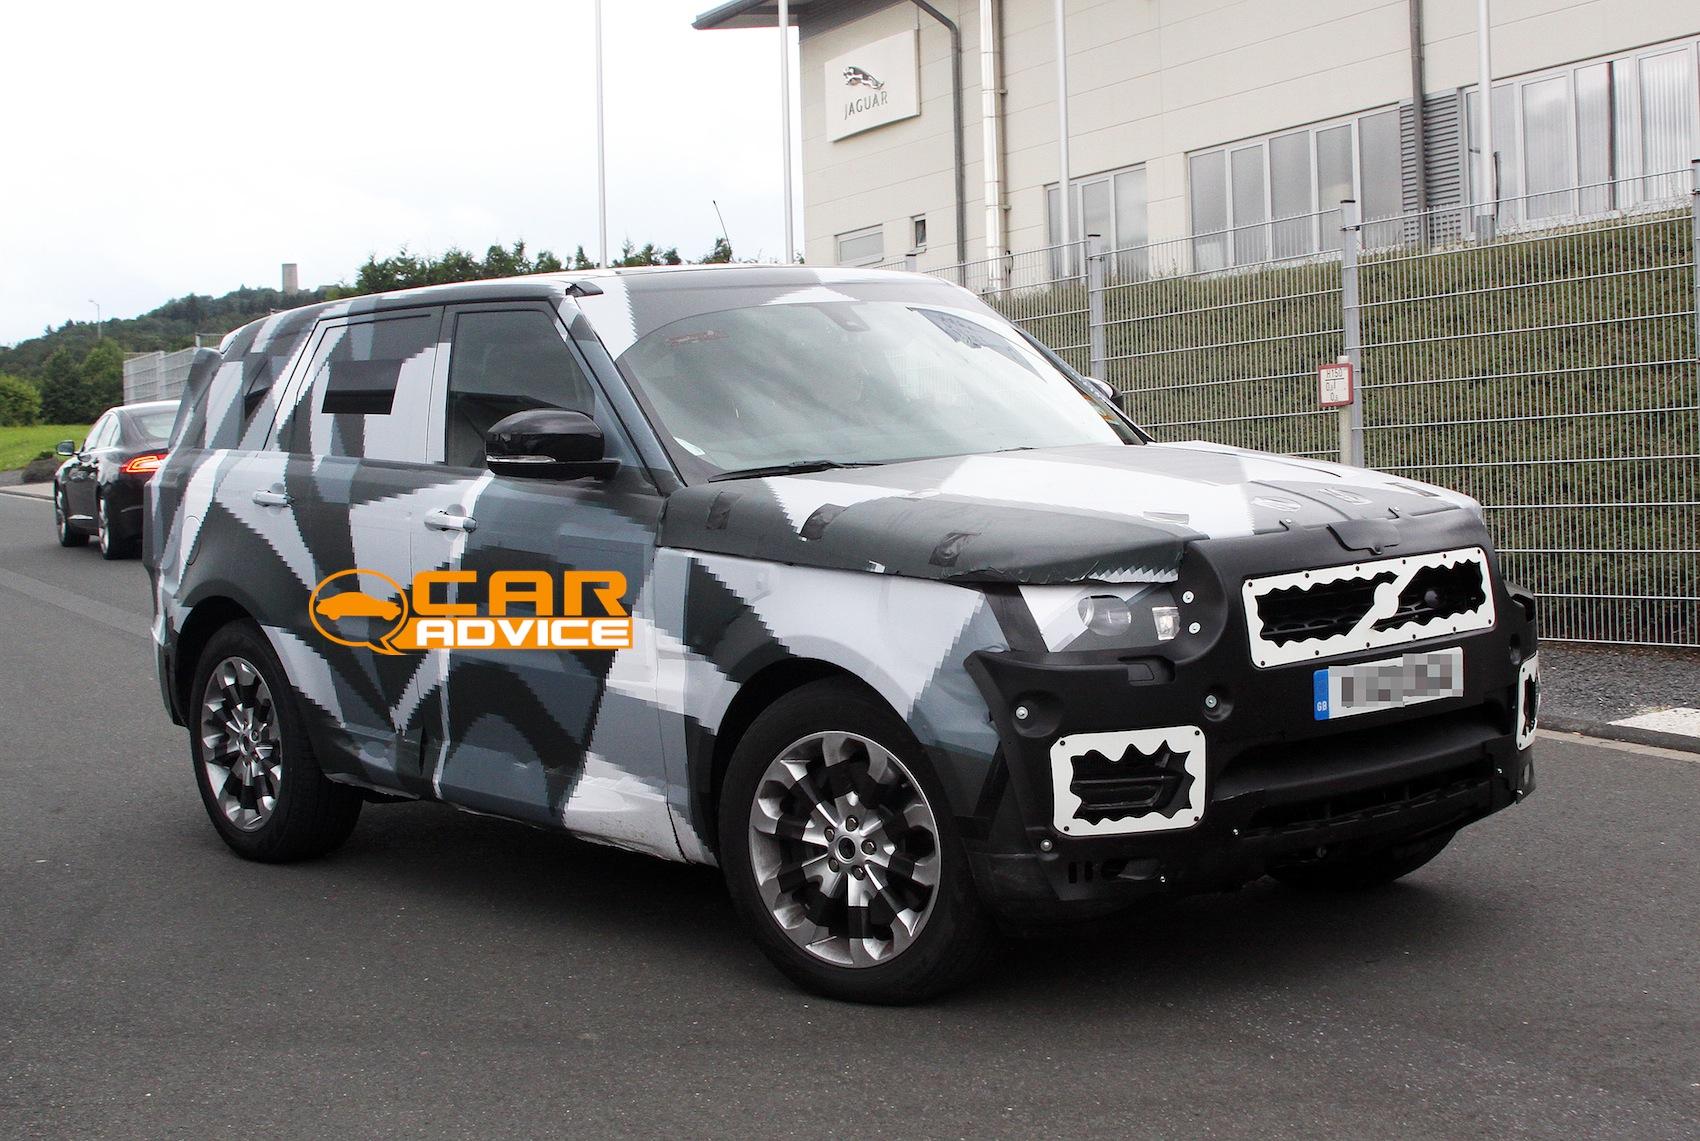 New U.K. Automaker Debuts Super SUV - Vehicles - LCT Magazine